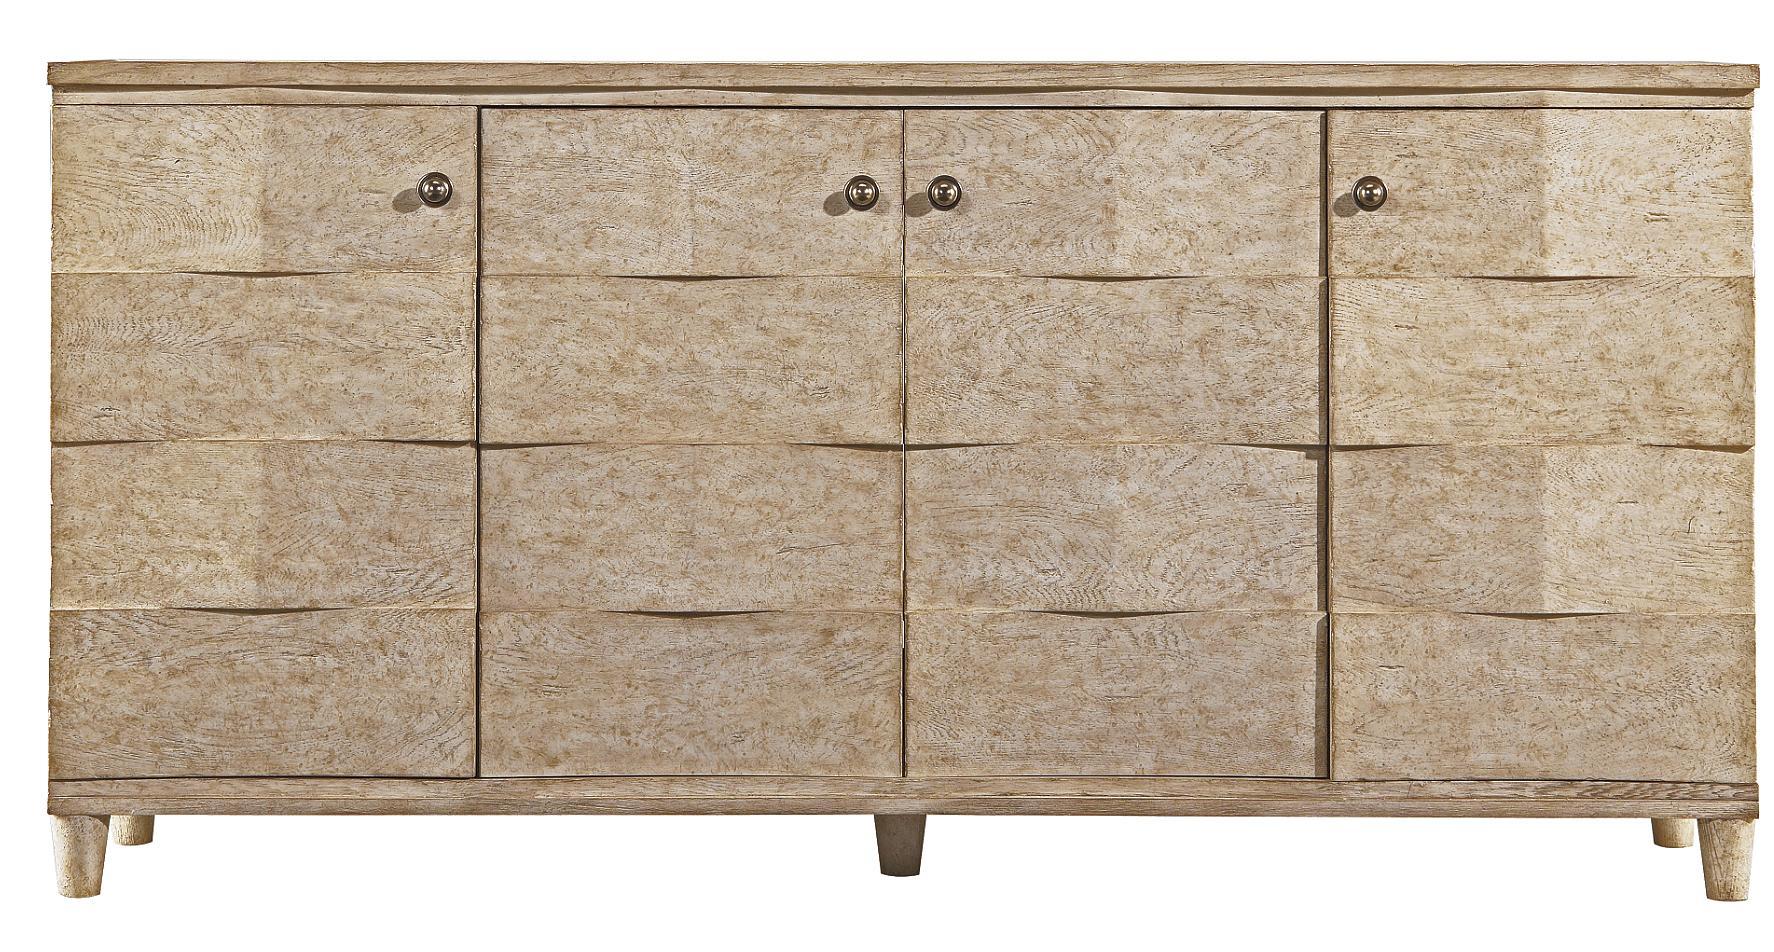 Stanley Furniture Coastal Living Resort Ocean Breakers Console - Item Number: 062-27-31